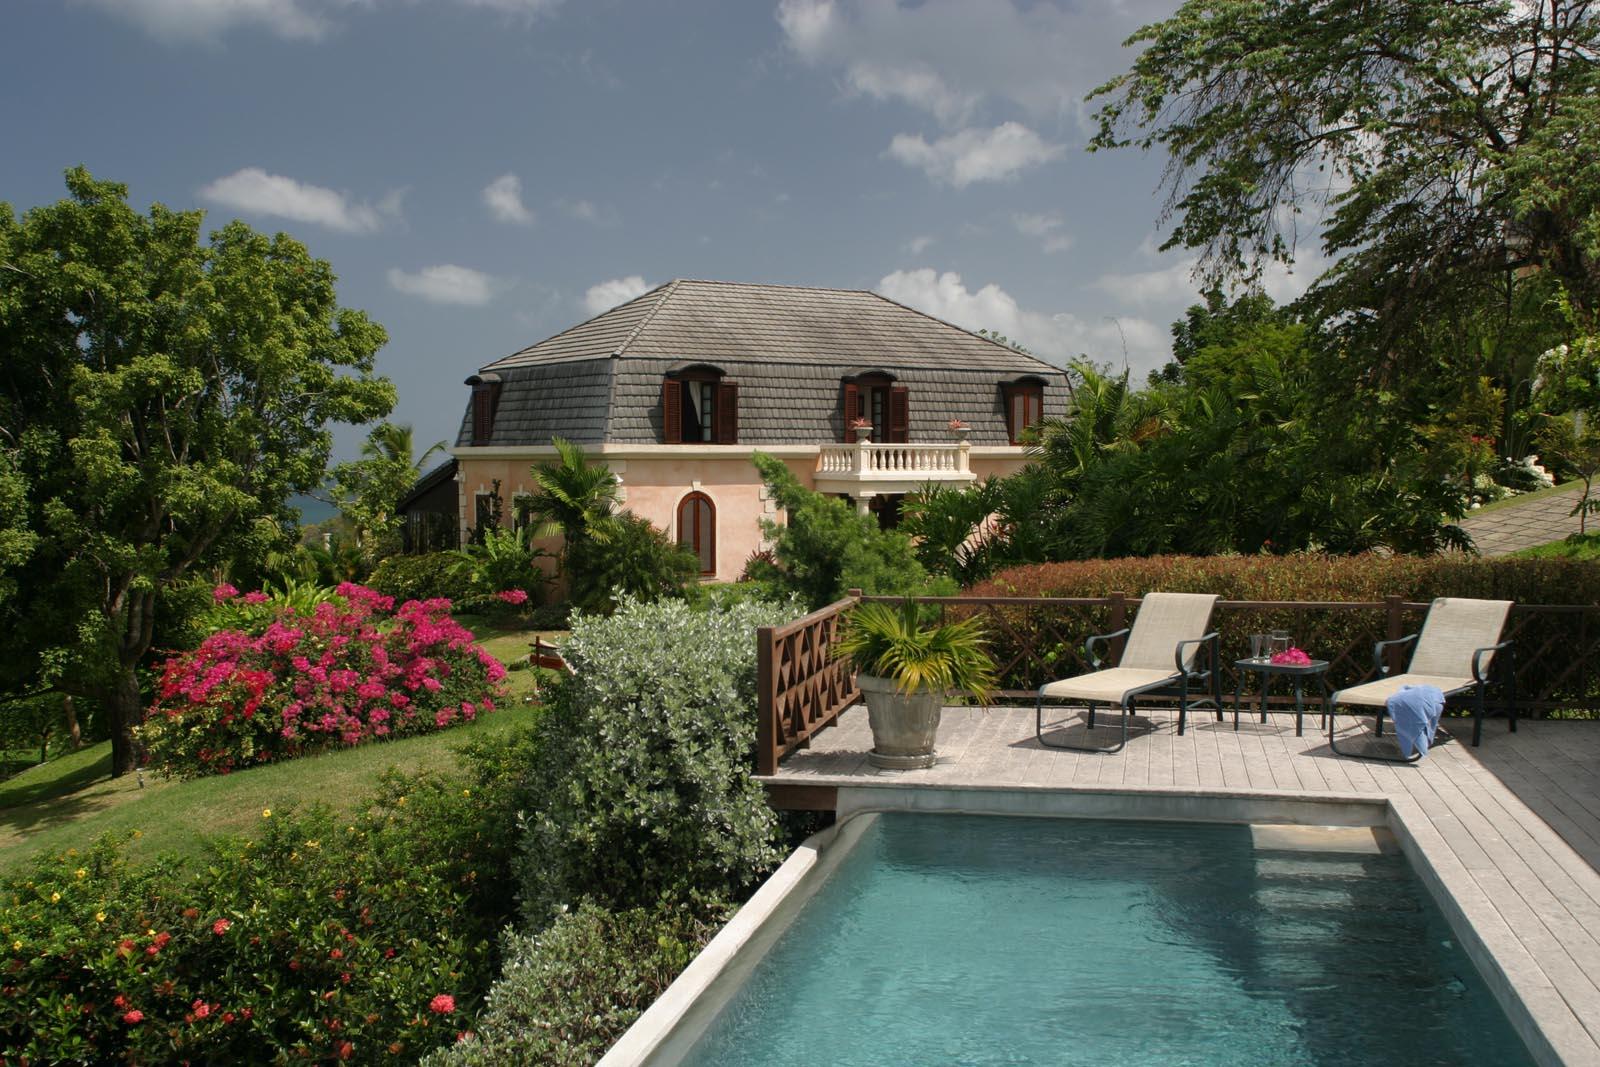 travel 2 the caribbean blog: luxury tobago getaway - the villas at